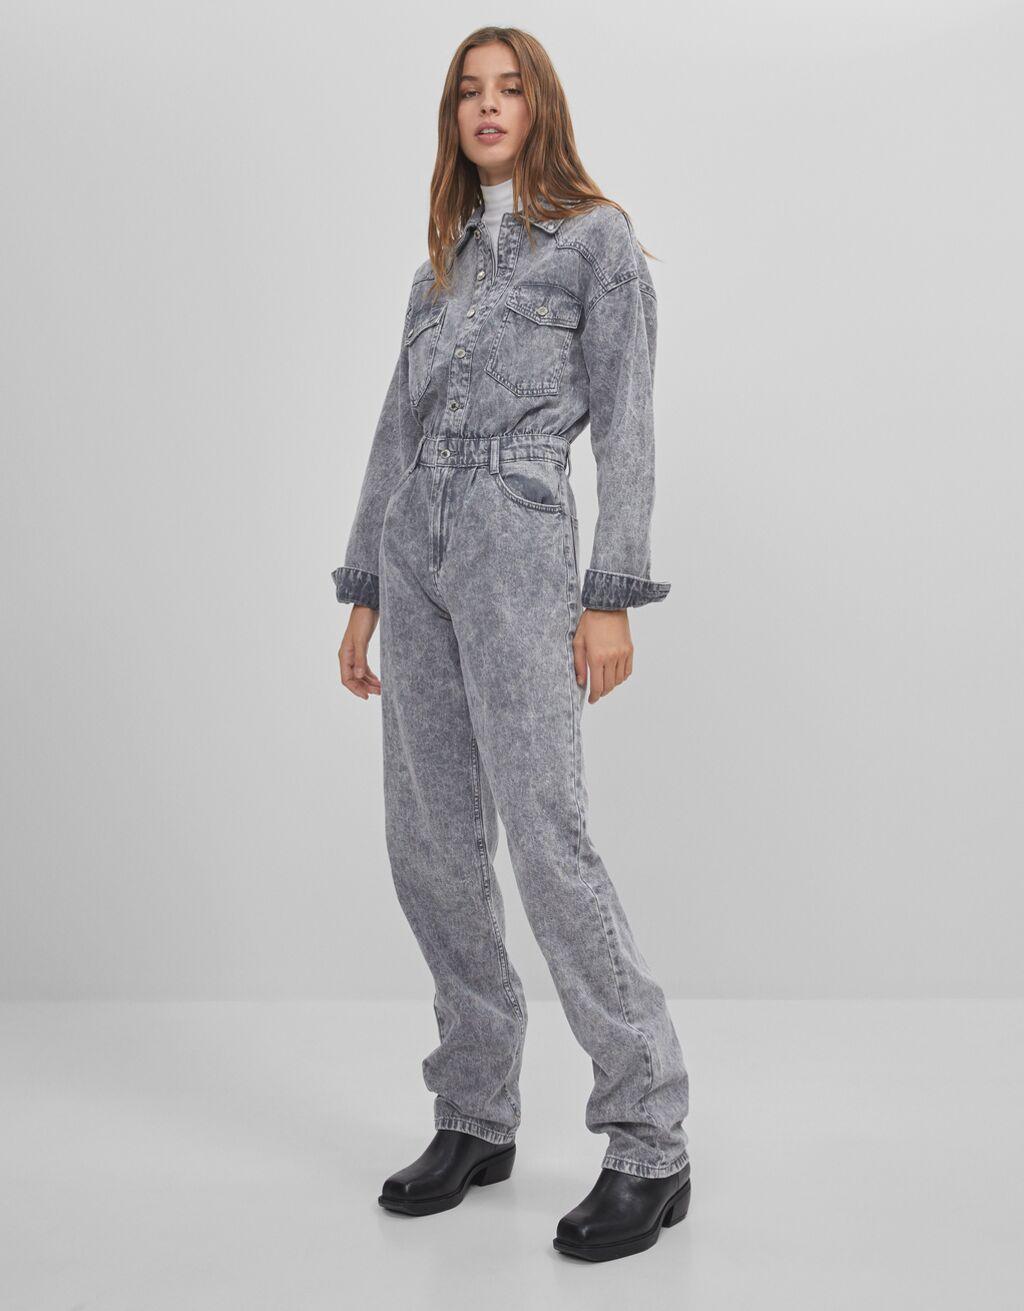 Lange Jeans-Latzhose - Kleider - Damen